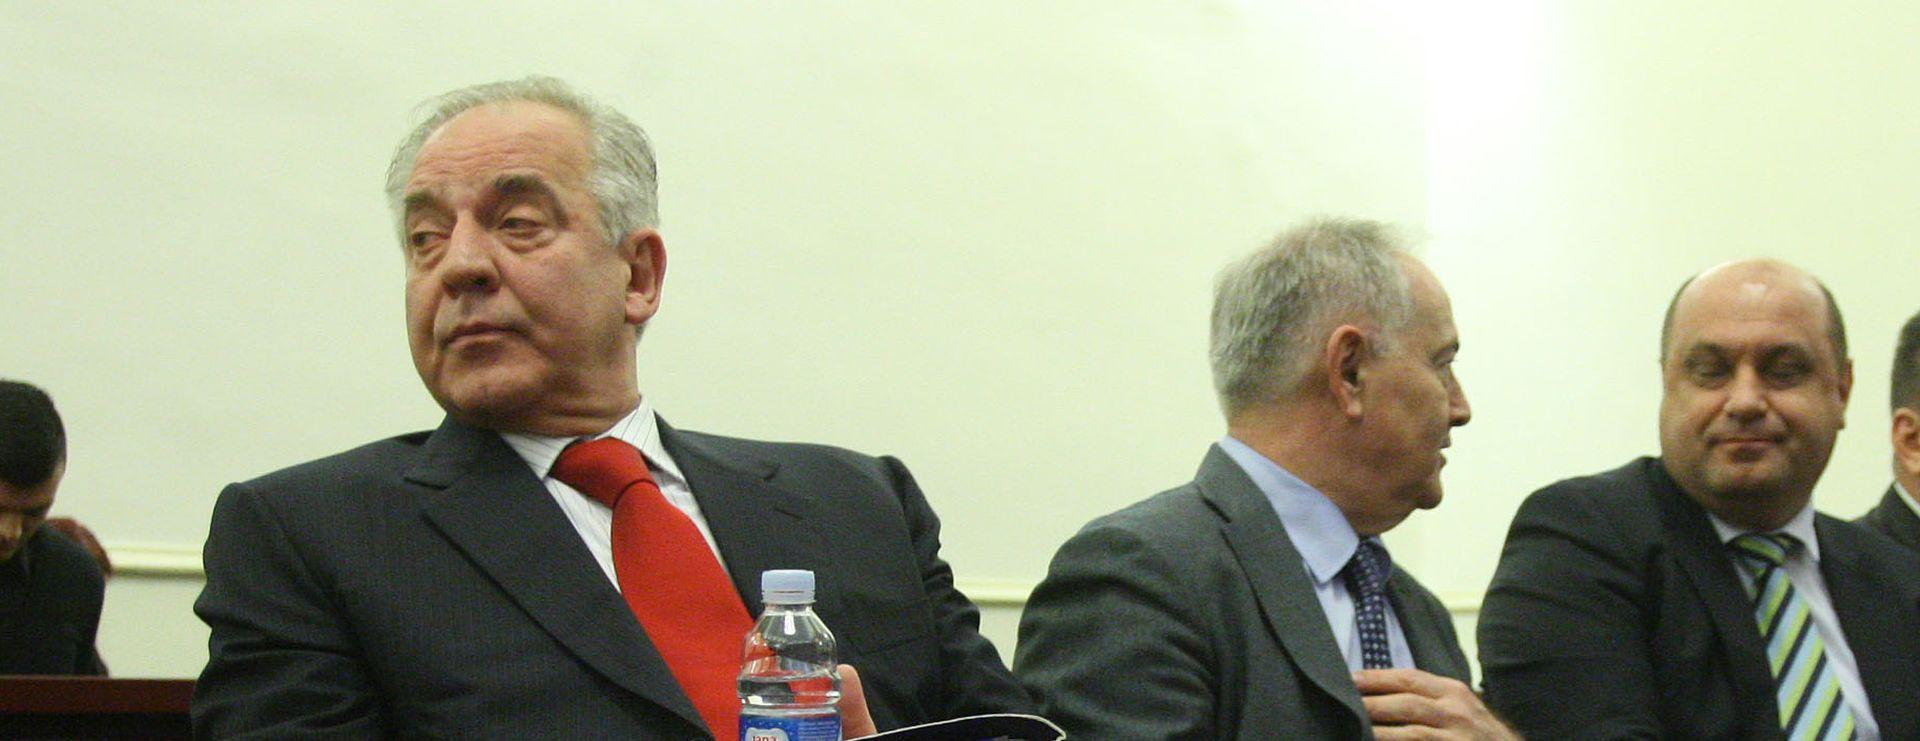 SLUČAJ PLANINSKA: Sanader ponovno proziva Kosor, Čobankovića i Fiolića